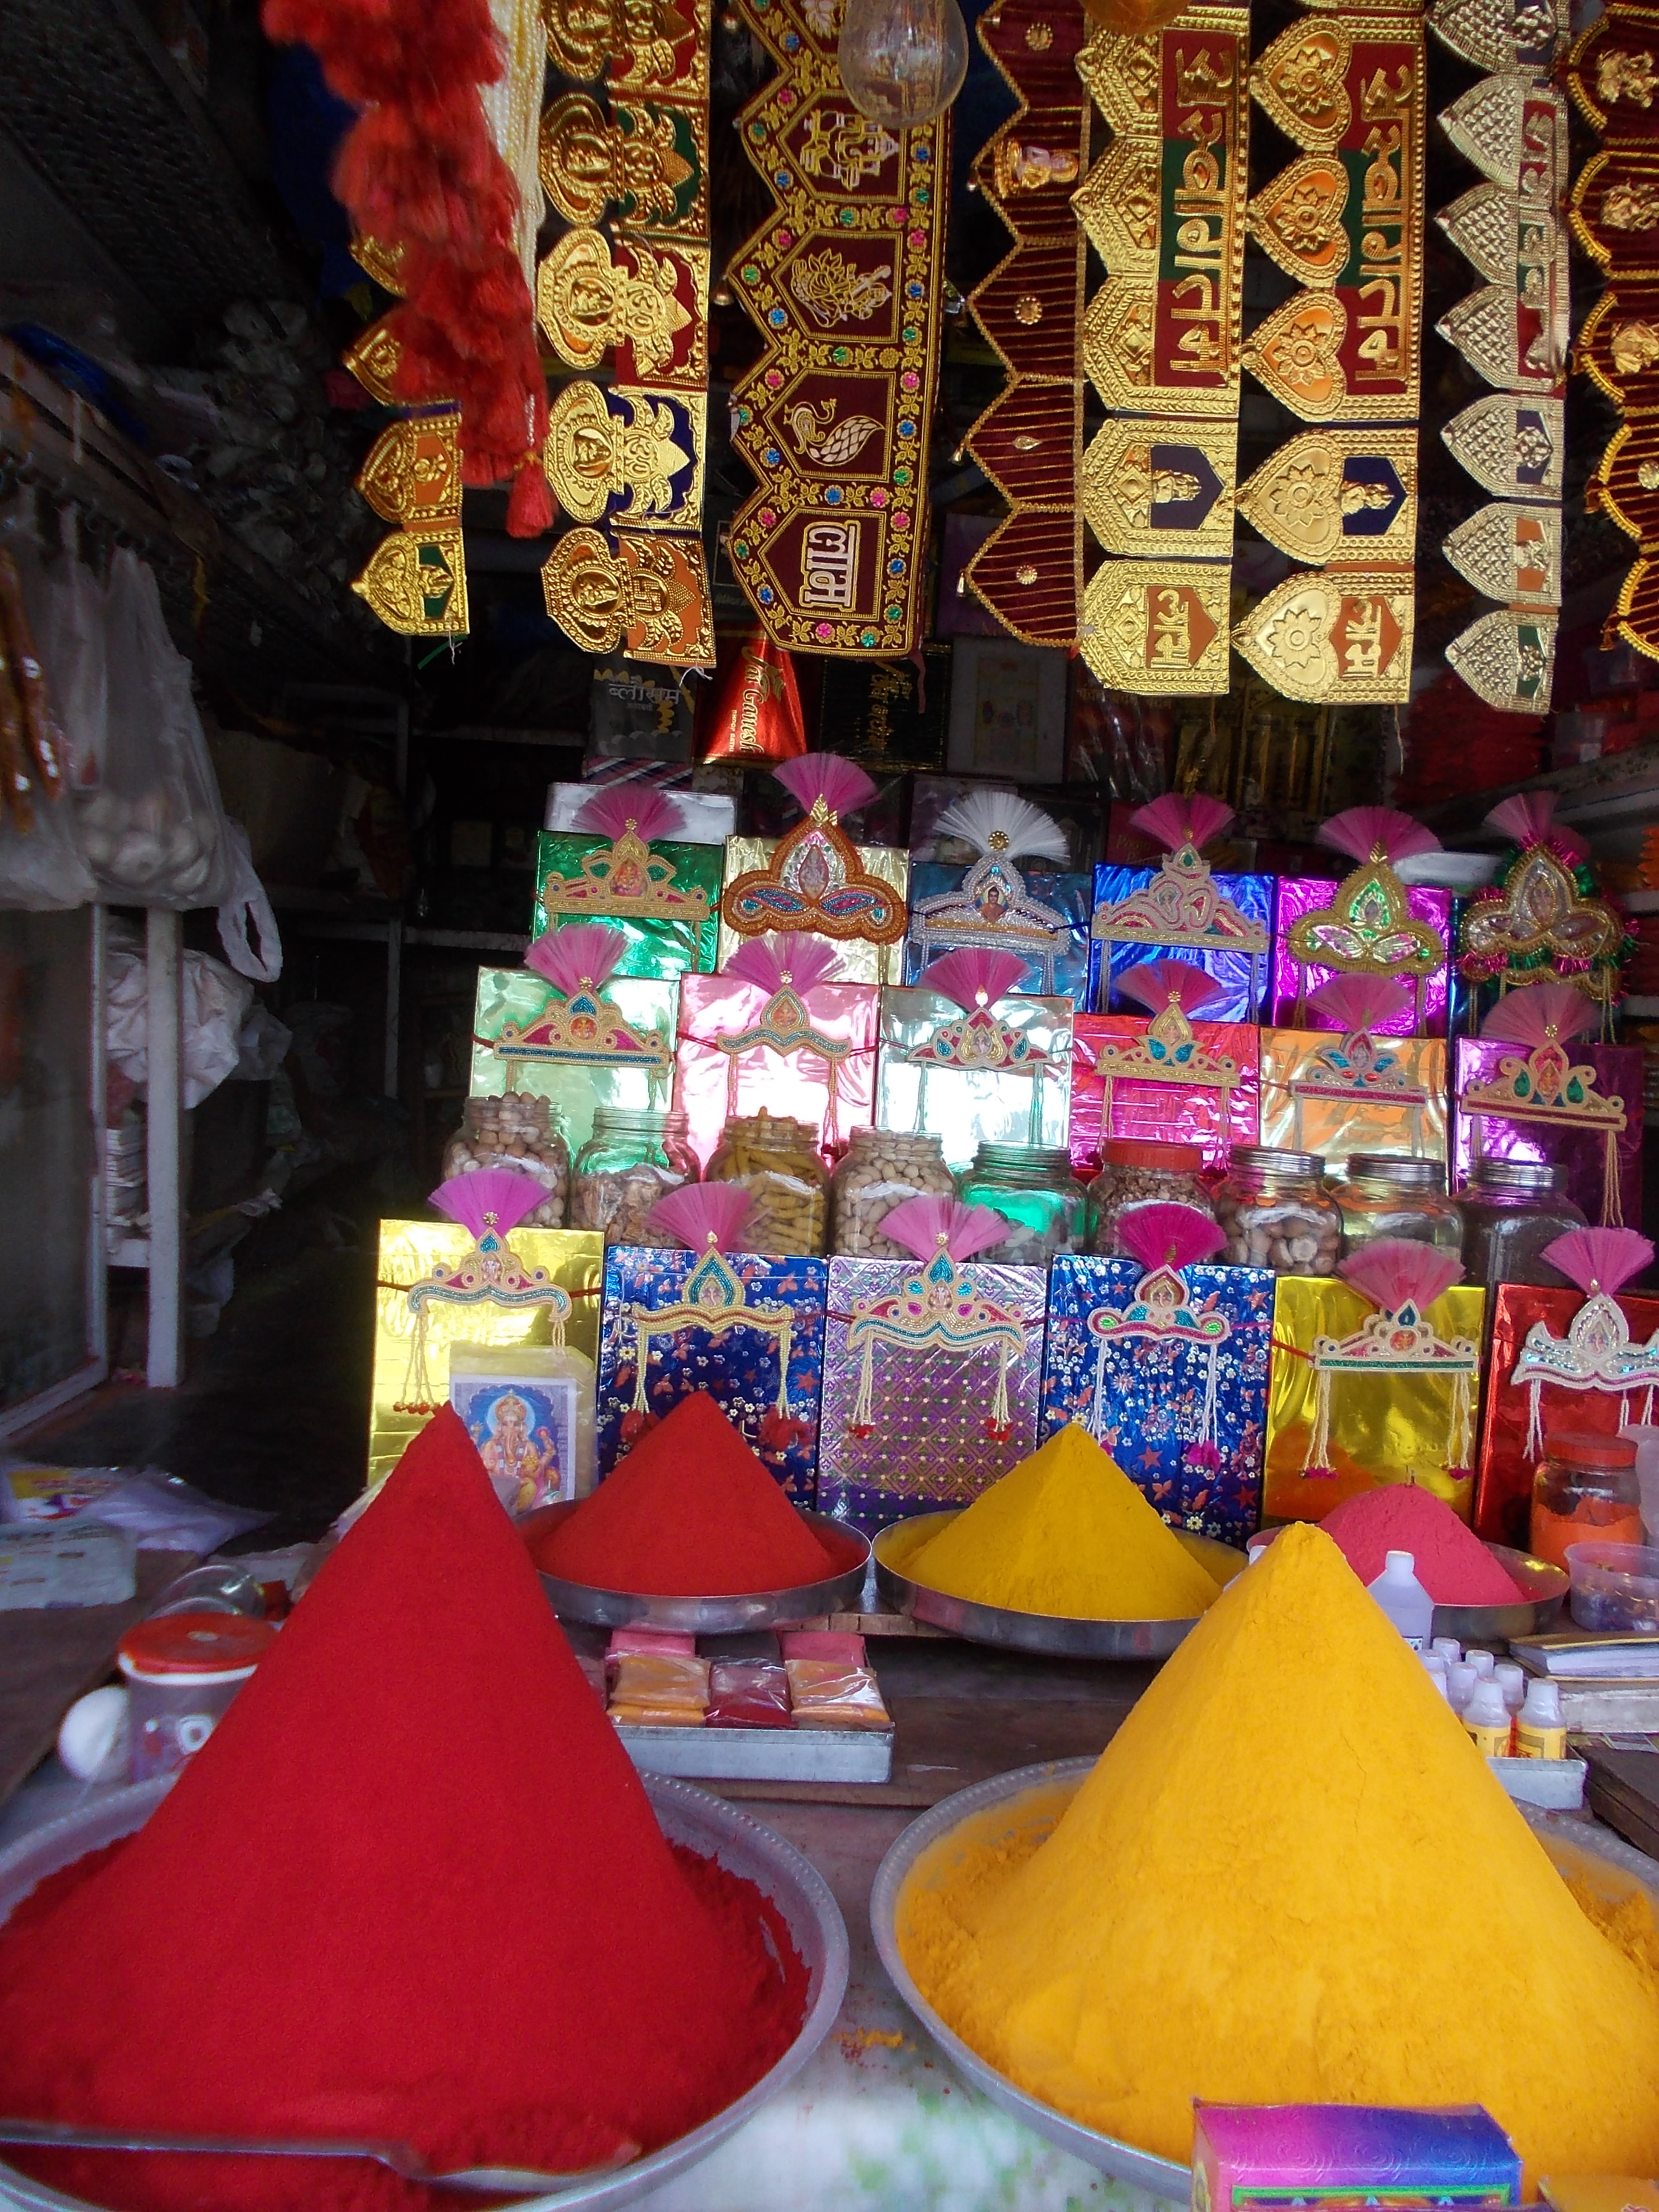 File:Haldi(Turmeric) and Sindoor in the street shop,Pune JPG